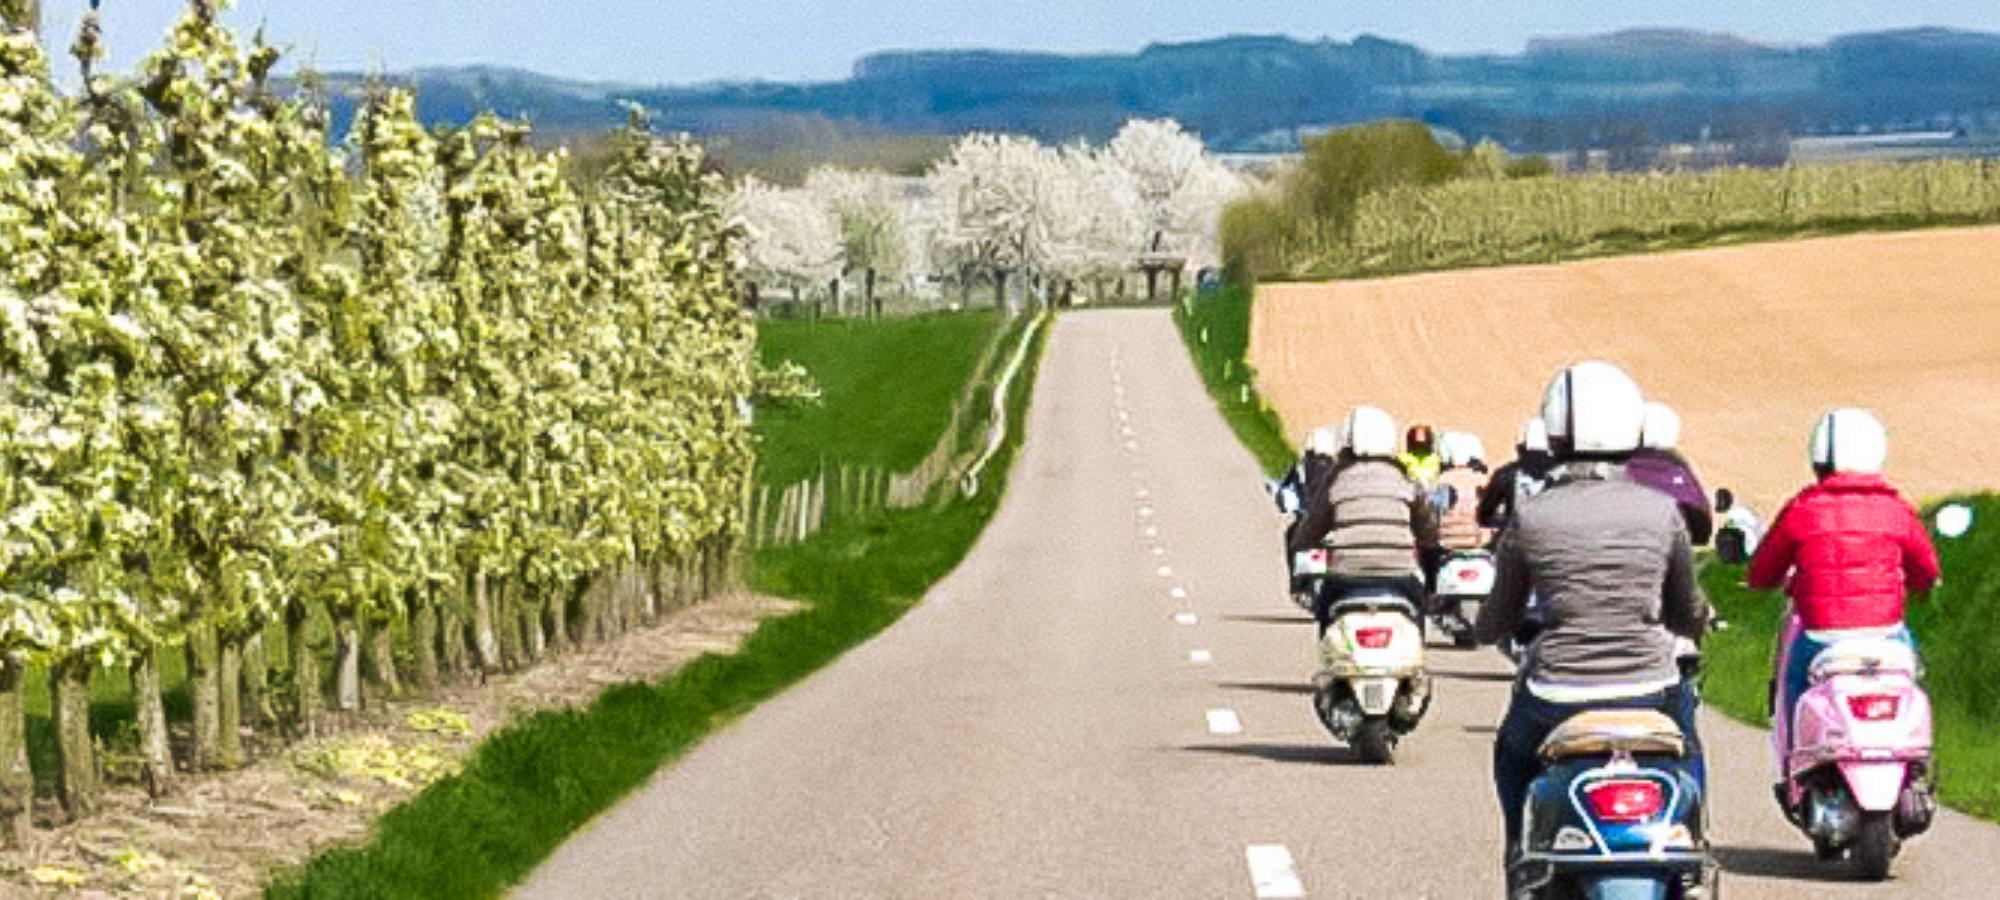 Vespa riders in a group riding through Haspengouw, Belgium